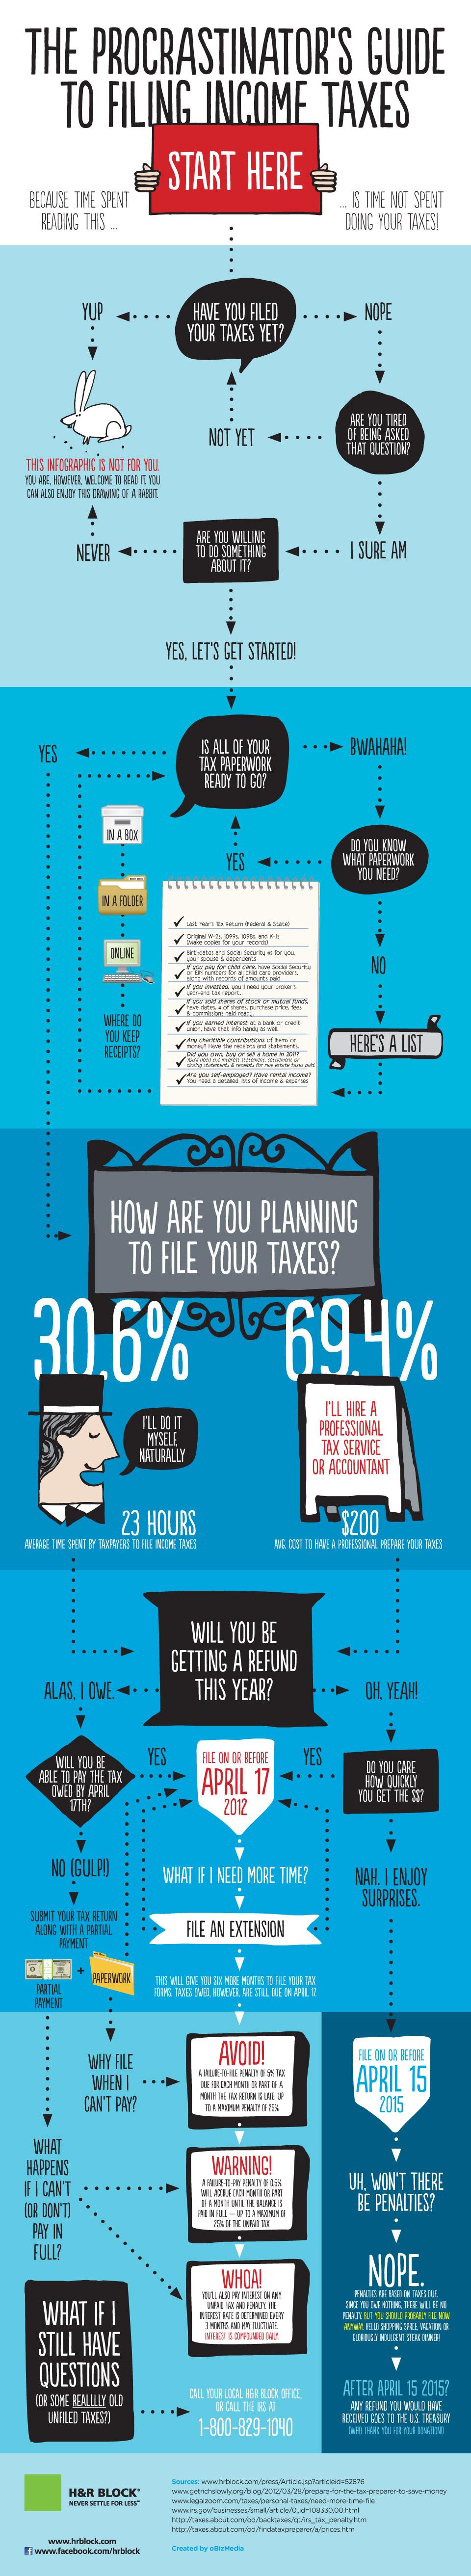 Best 25 deadline to file taxes ideas on pinterest tax filing best 25 deadline to file taxes ideas on pinterest tax filing deadline tax deadline and file my taxes falaconquin